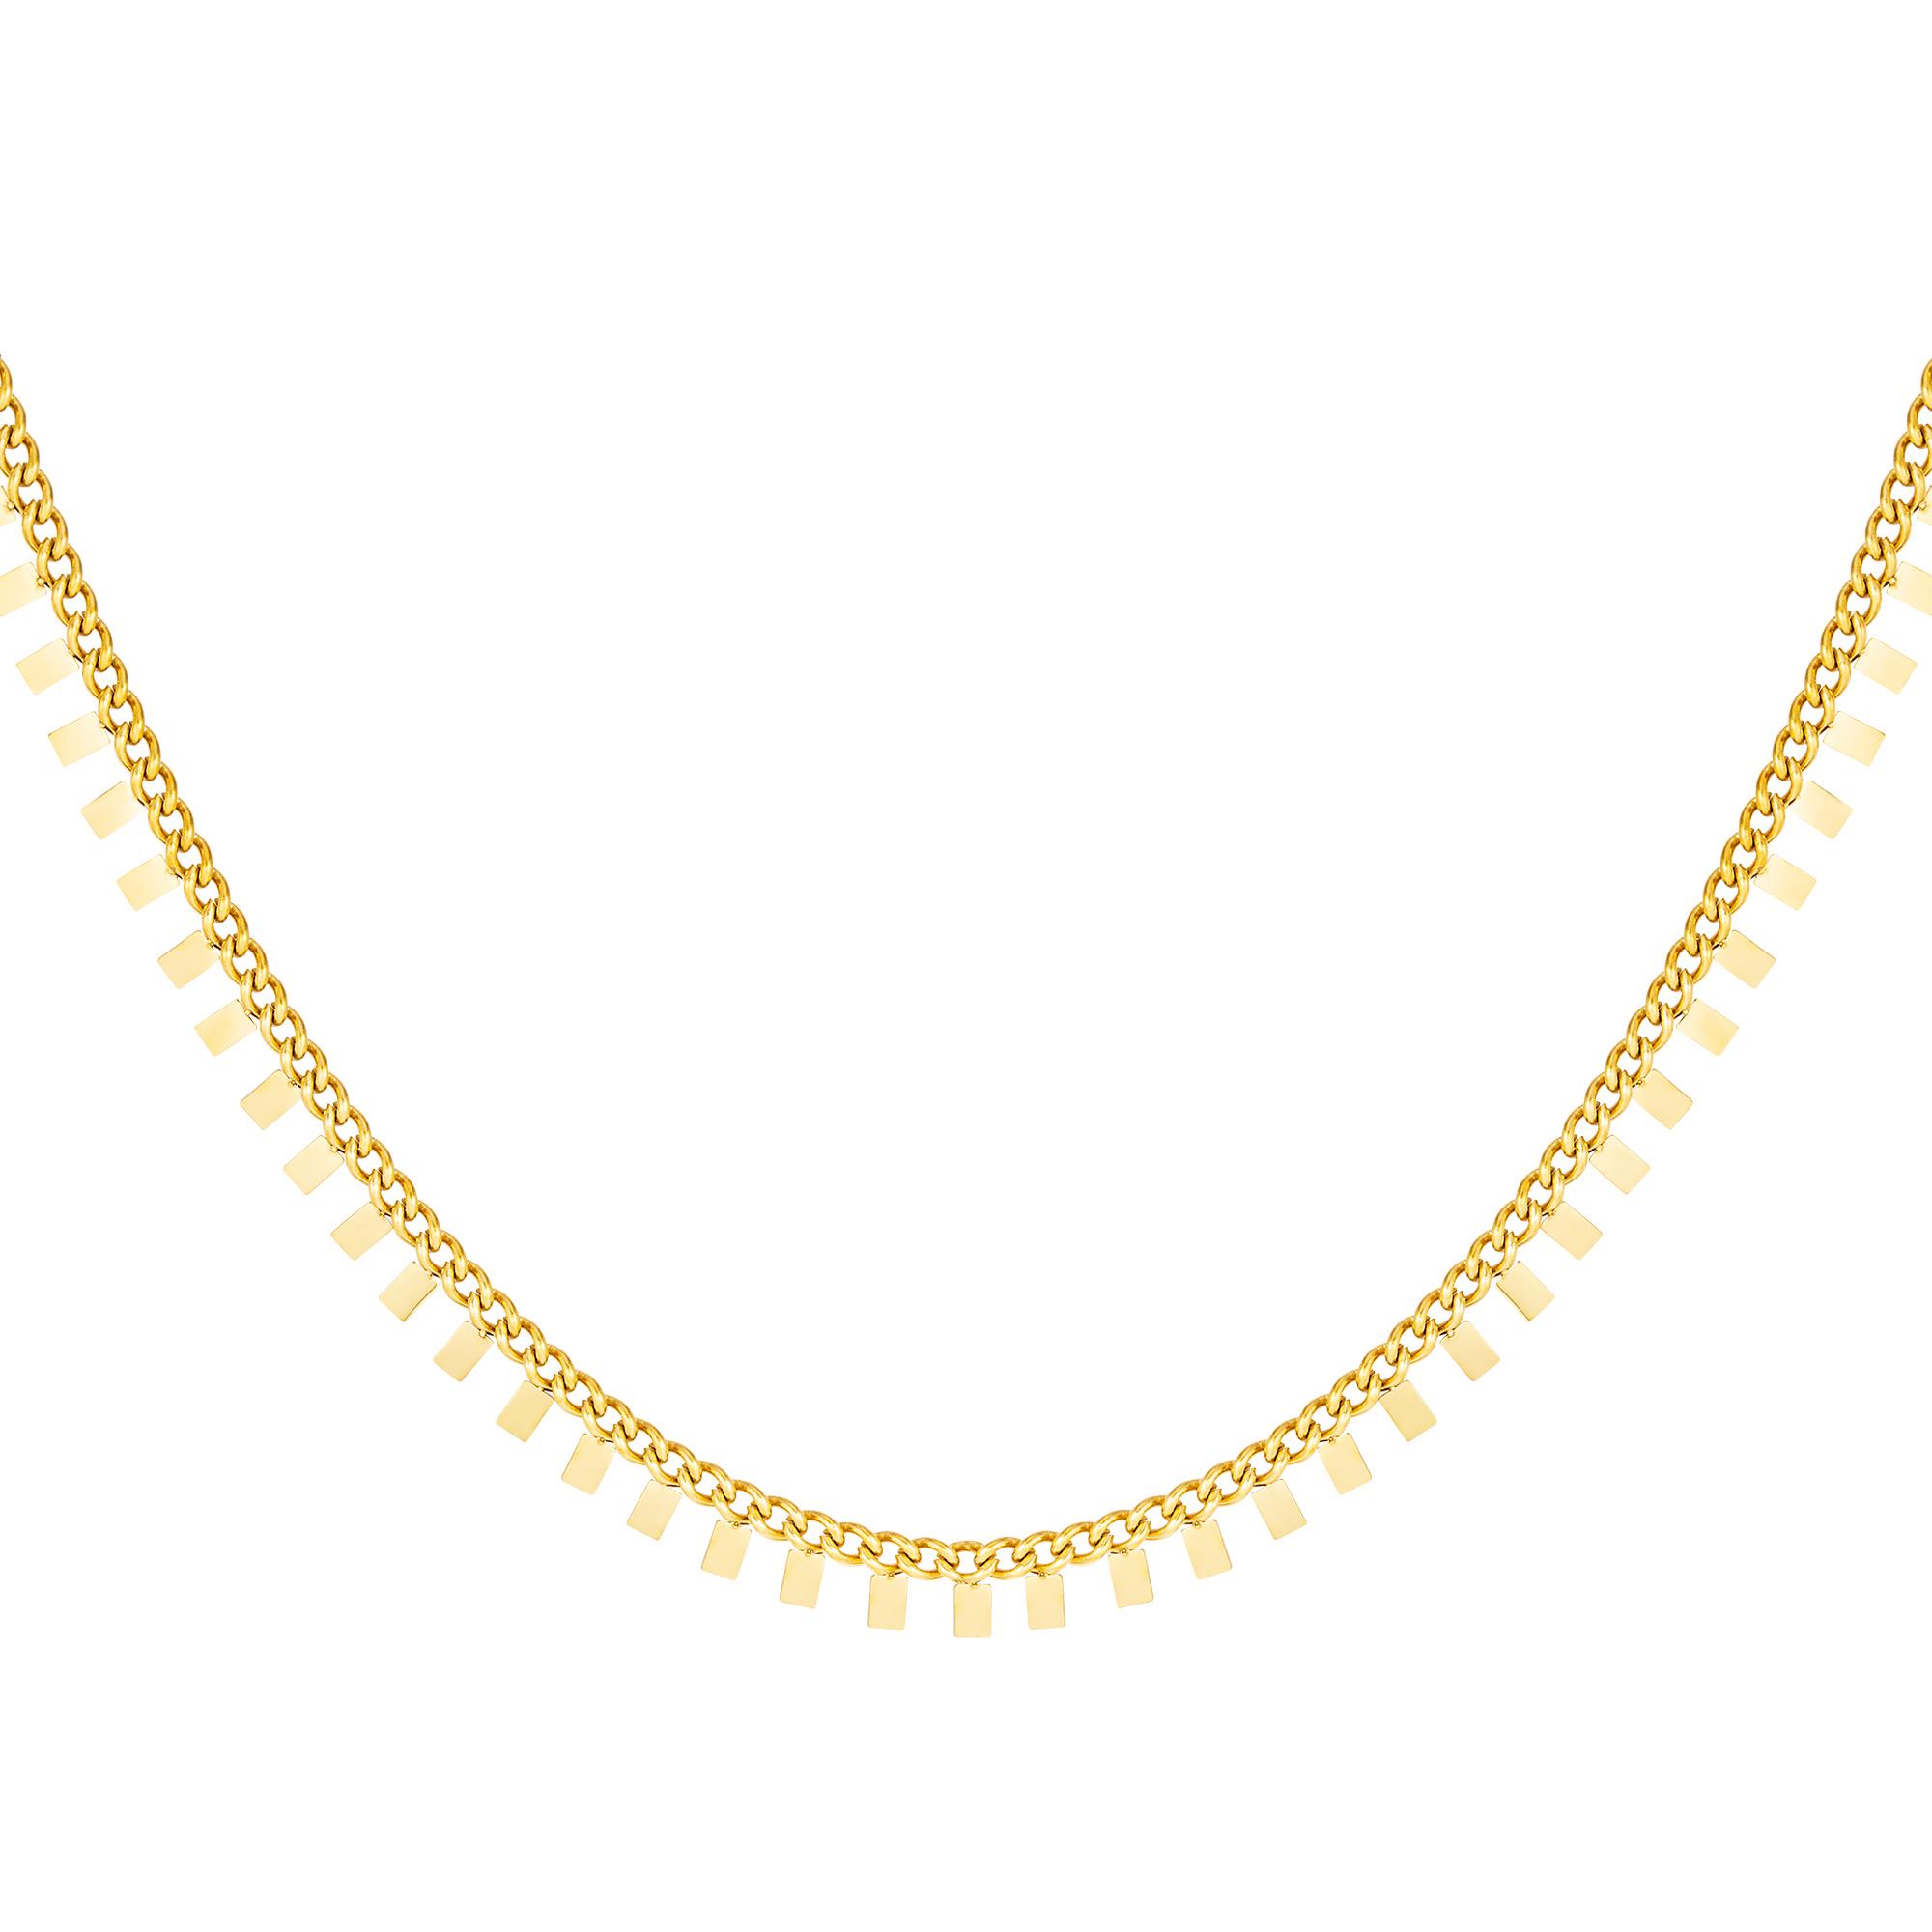 Halskette quadrate aus edelstahl